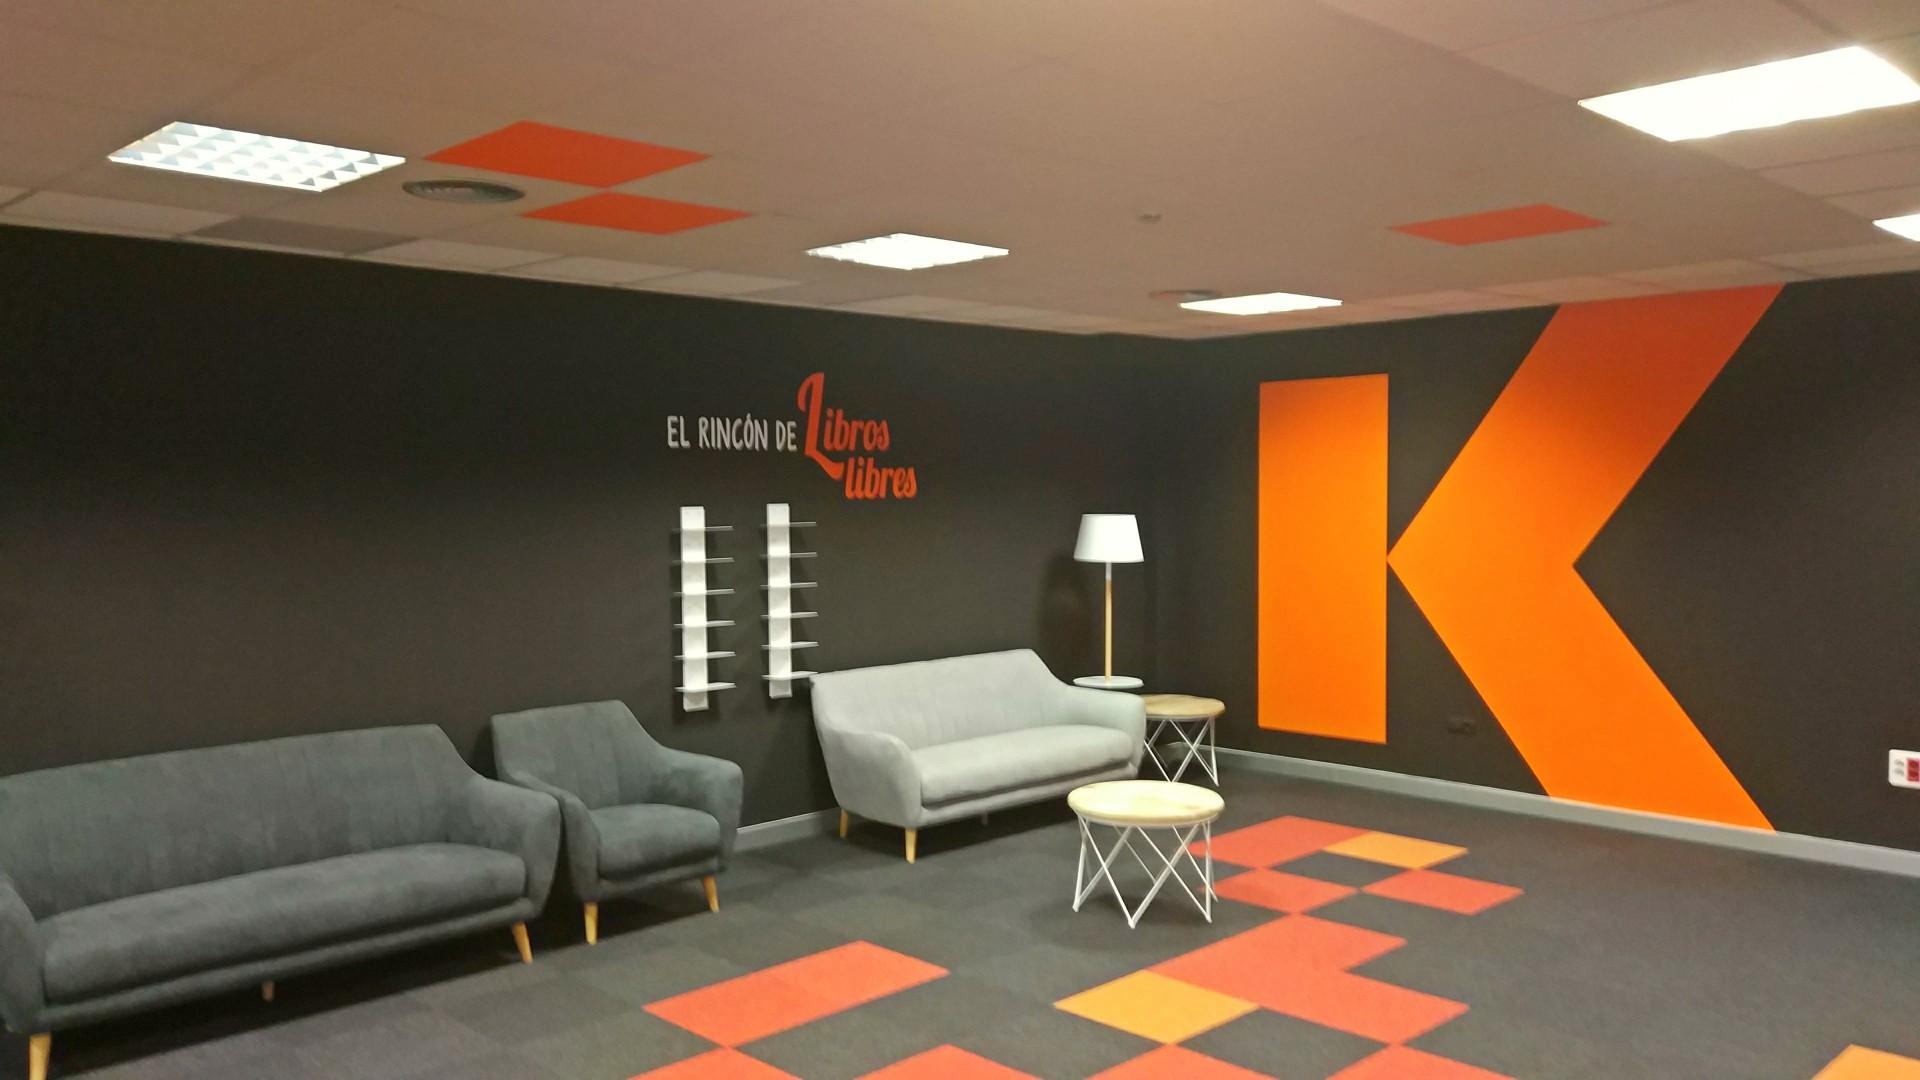 Oficinas-Blinker-Corporativo-Interiorismo10